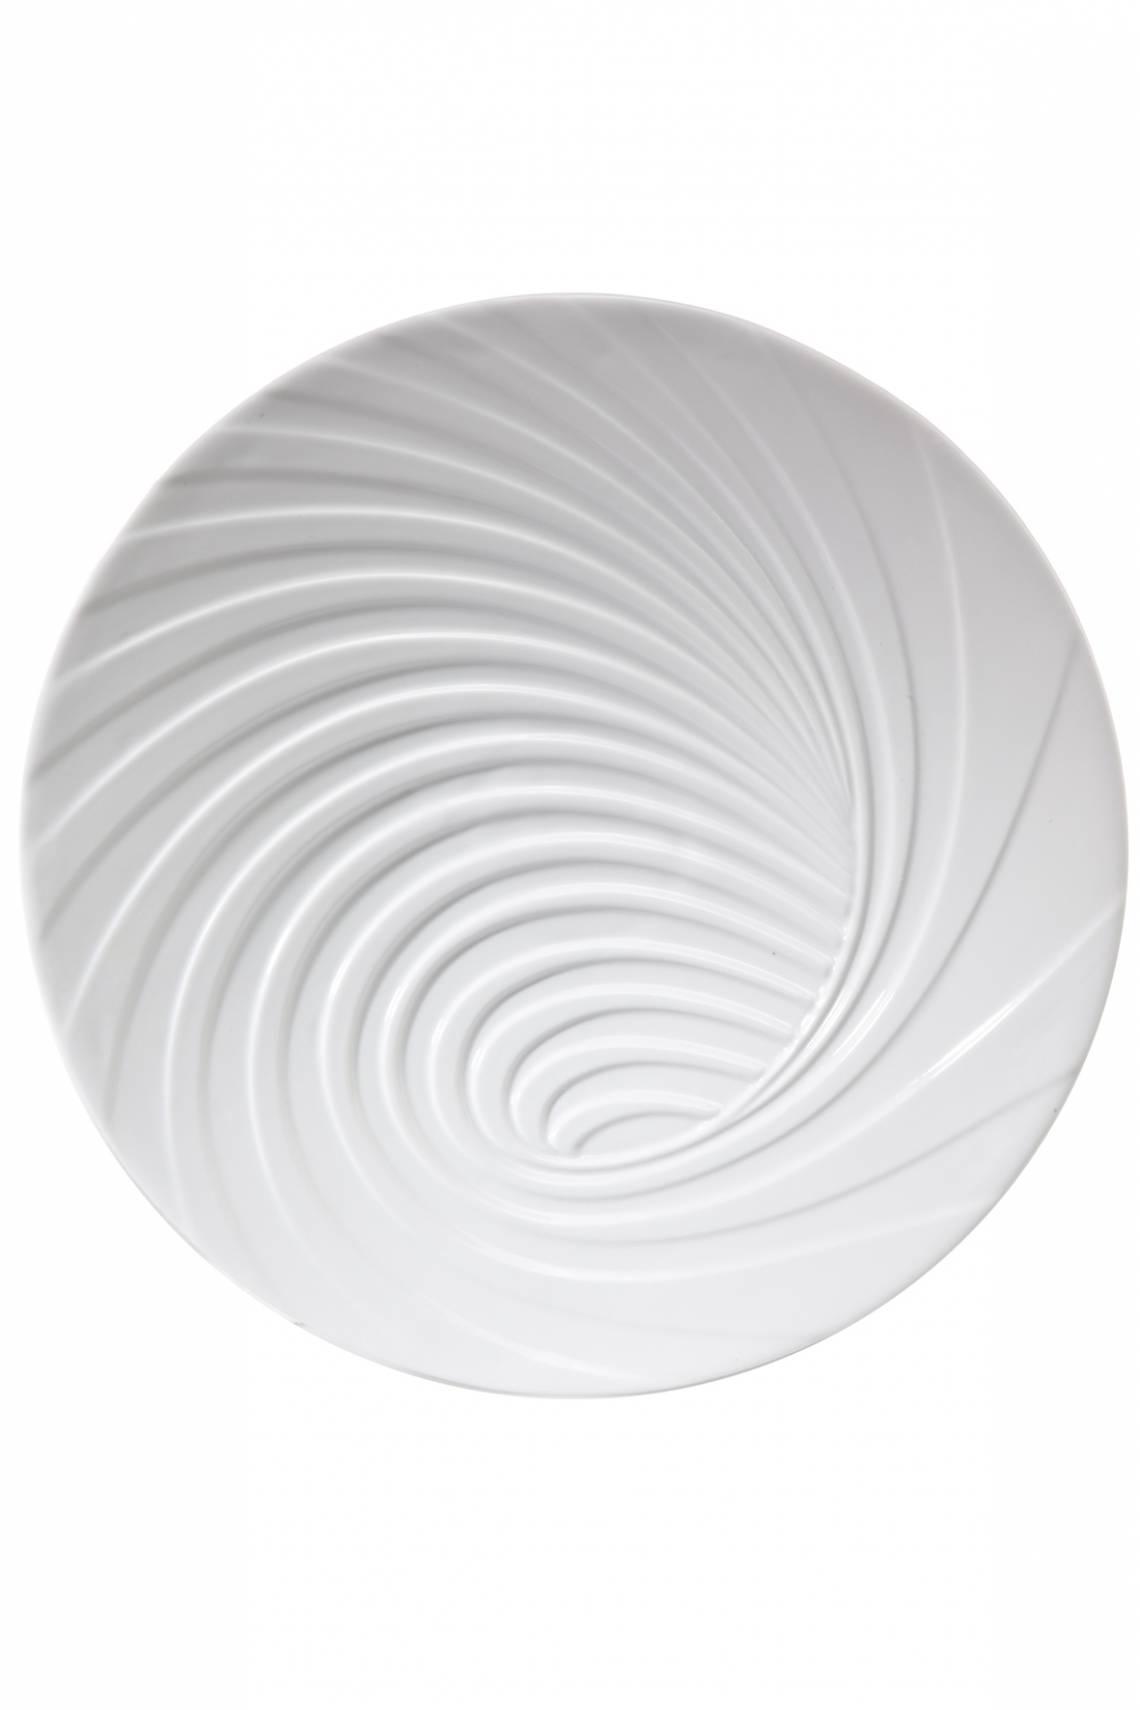 Kaiser Illusion Schale